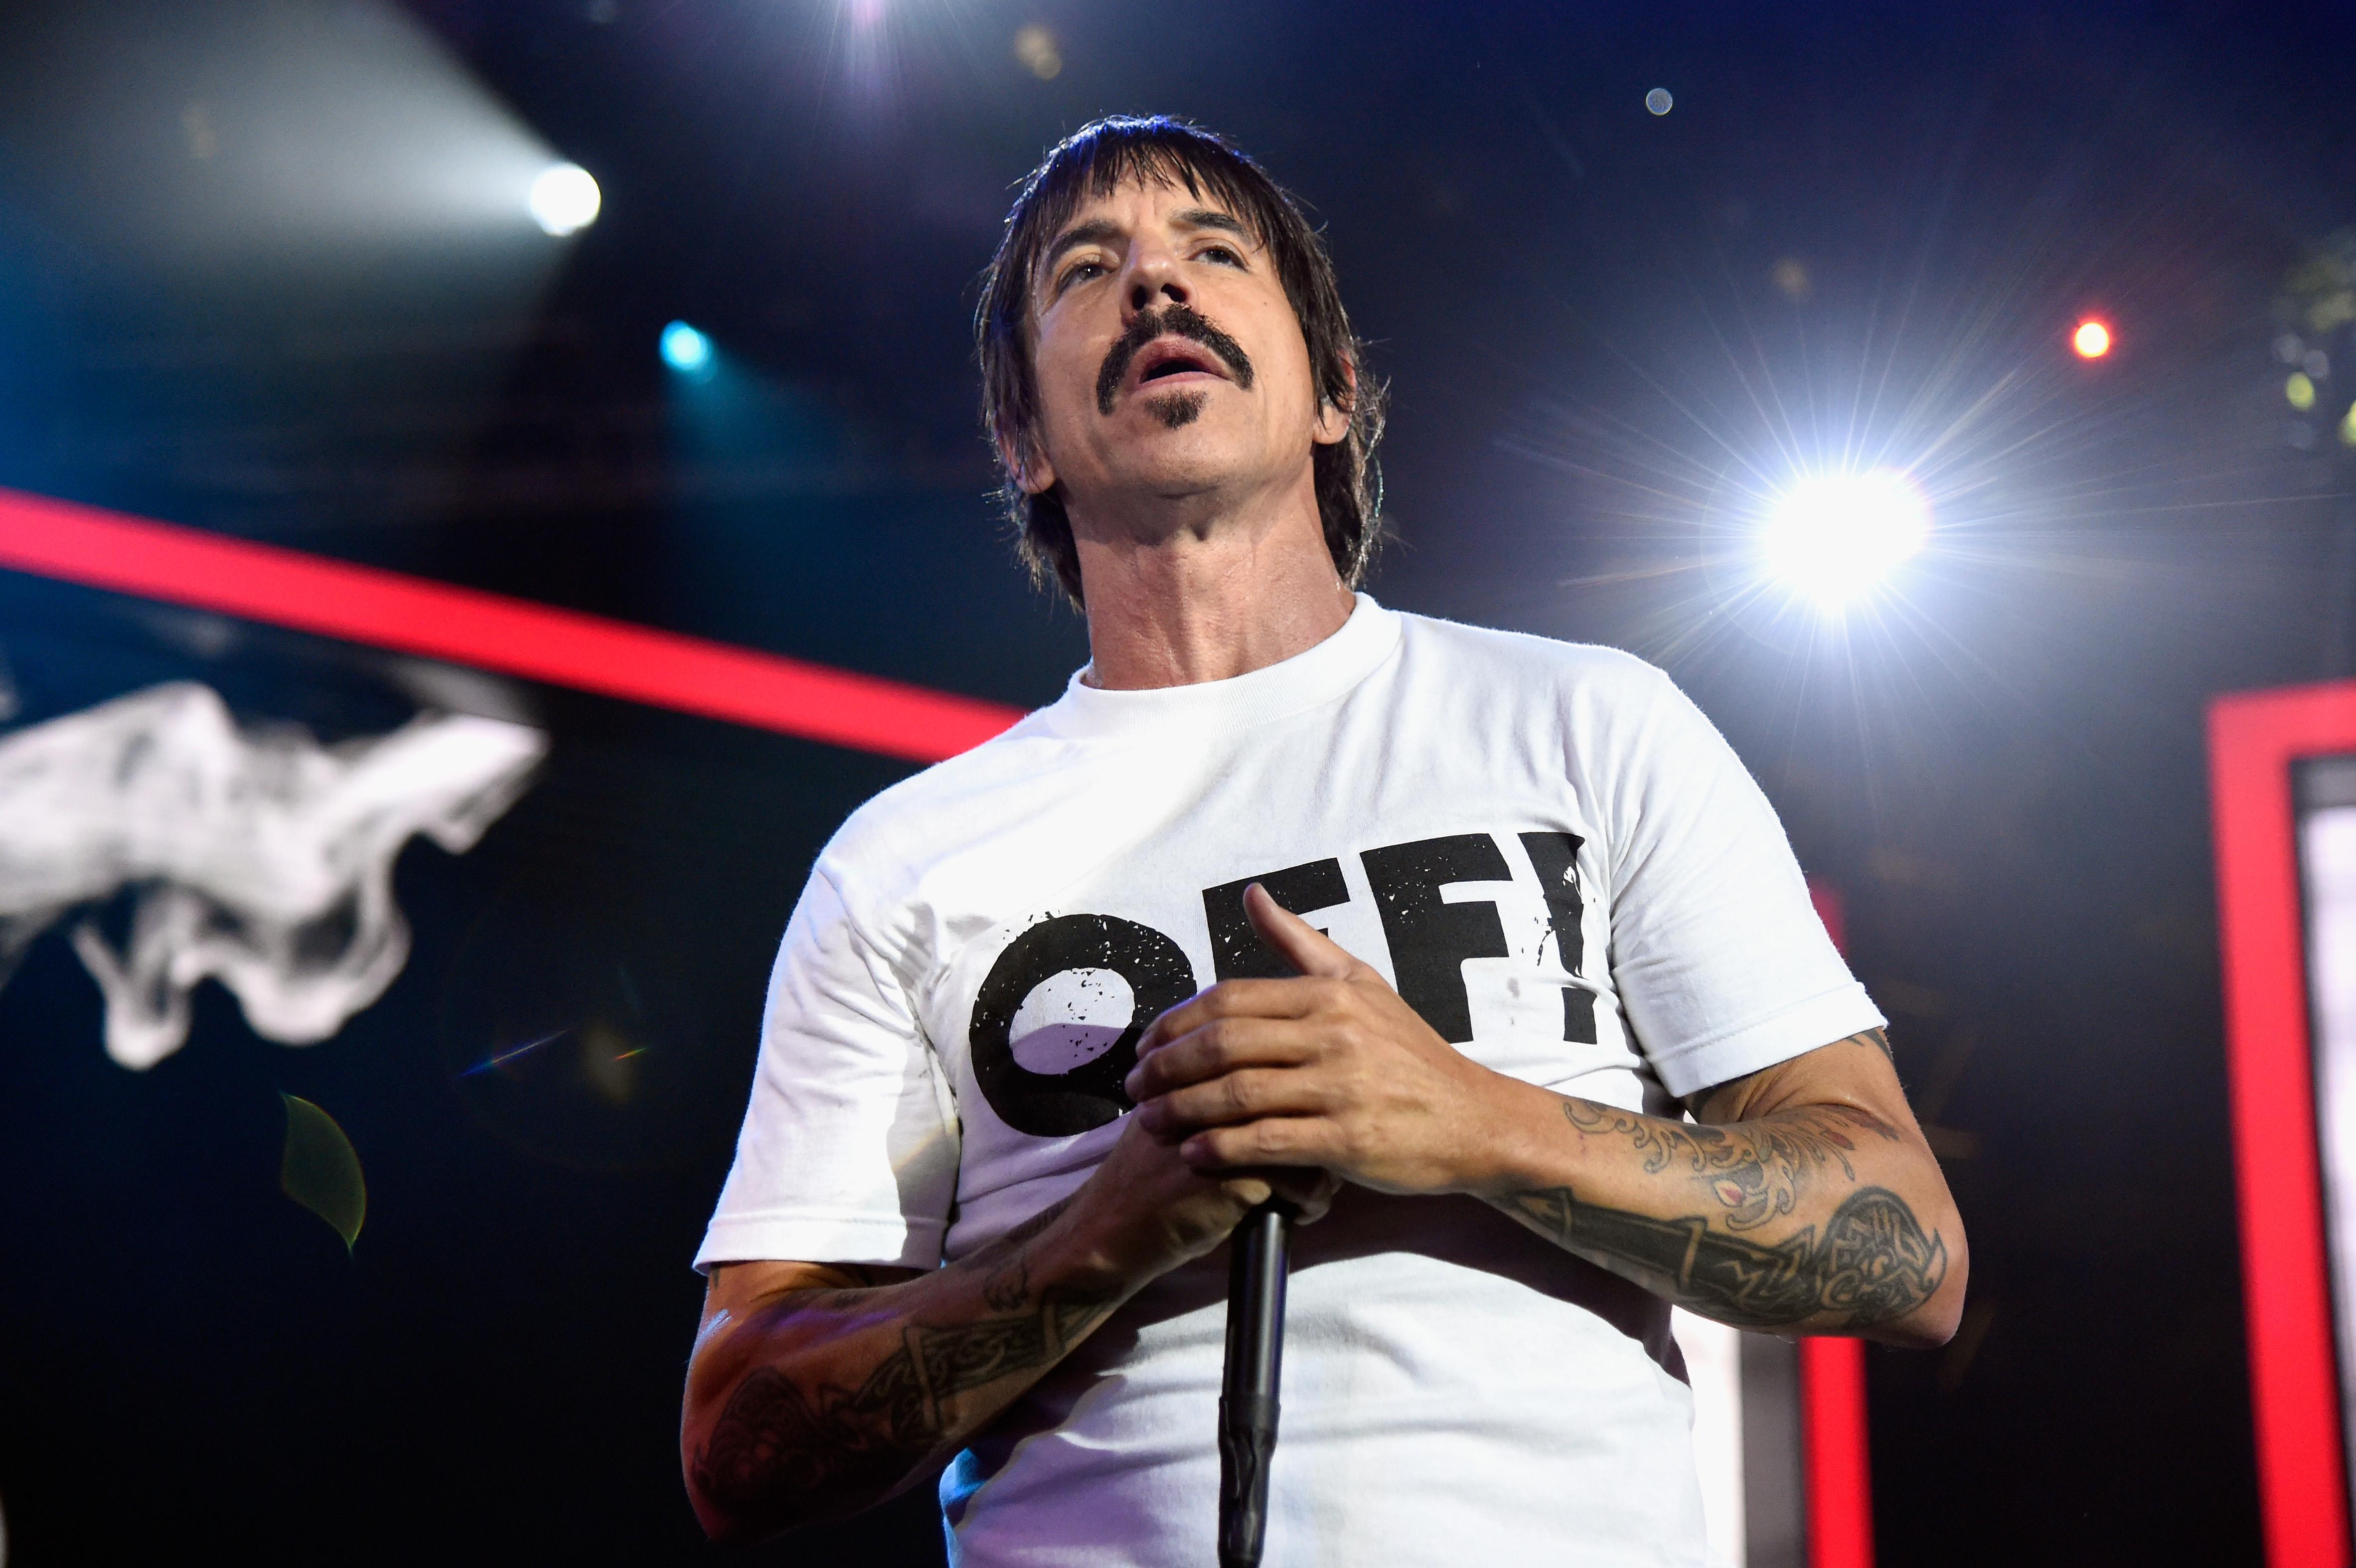 Anthony Kiedis flea